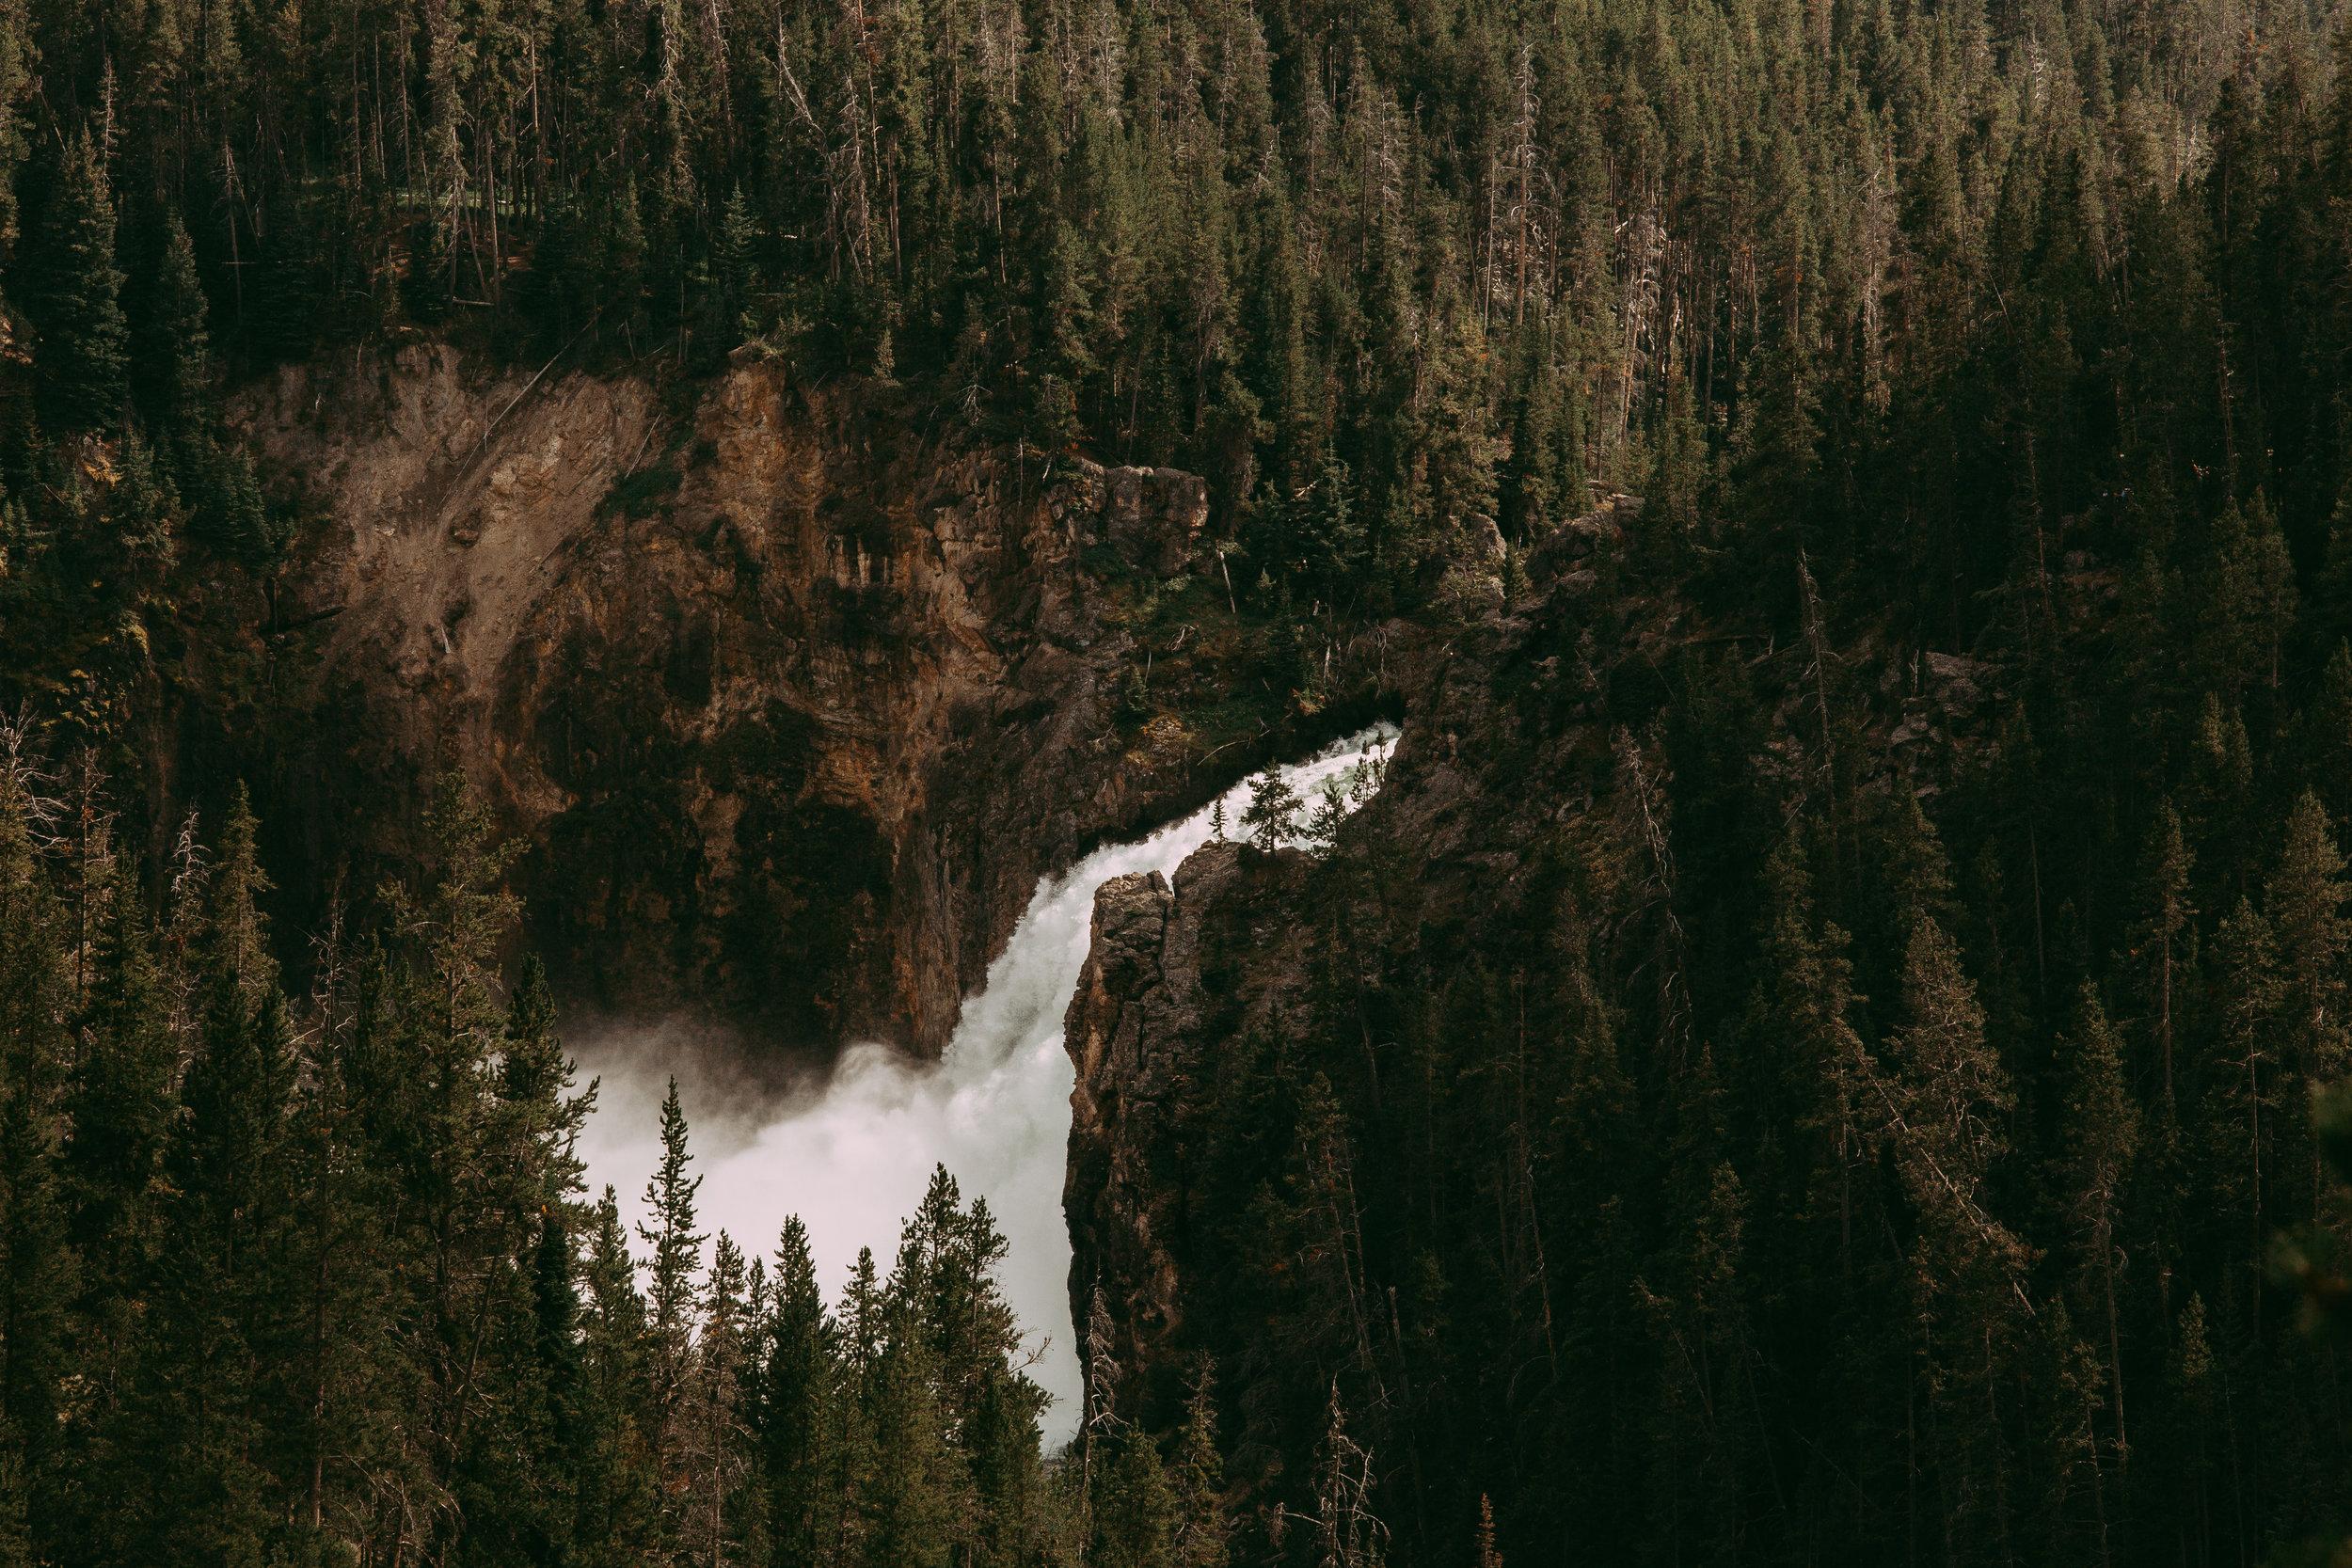 Upper Falls, Yellowstone